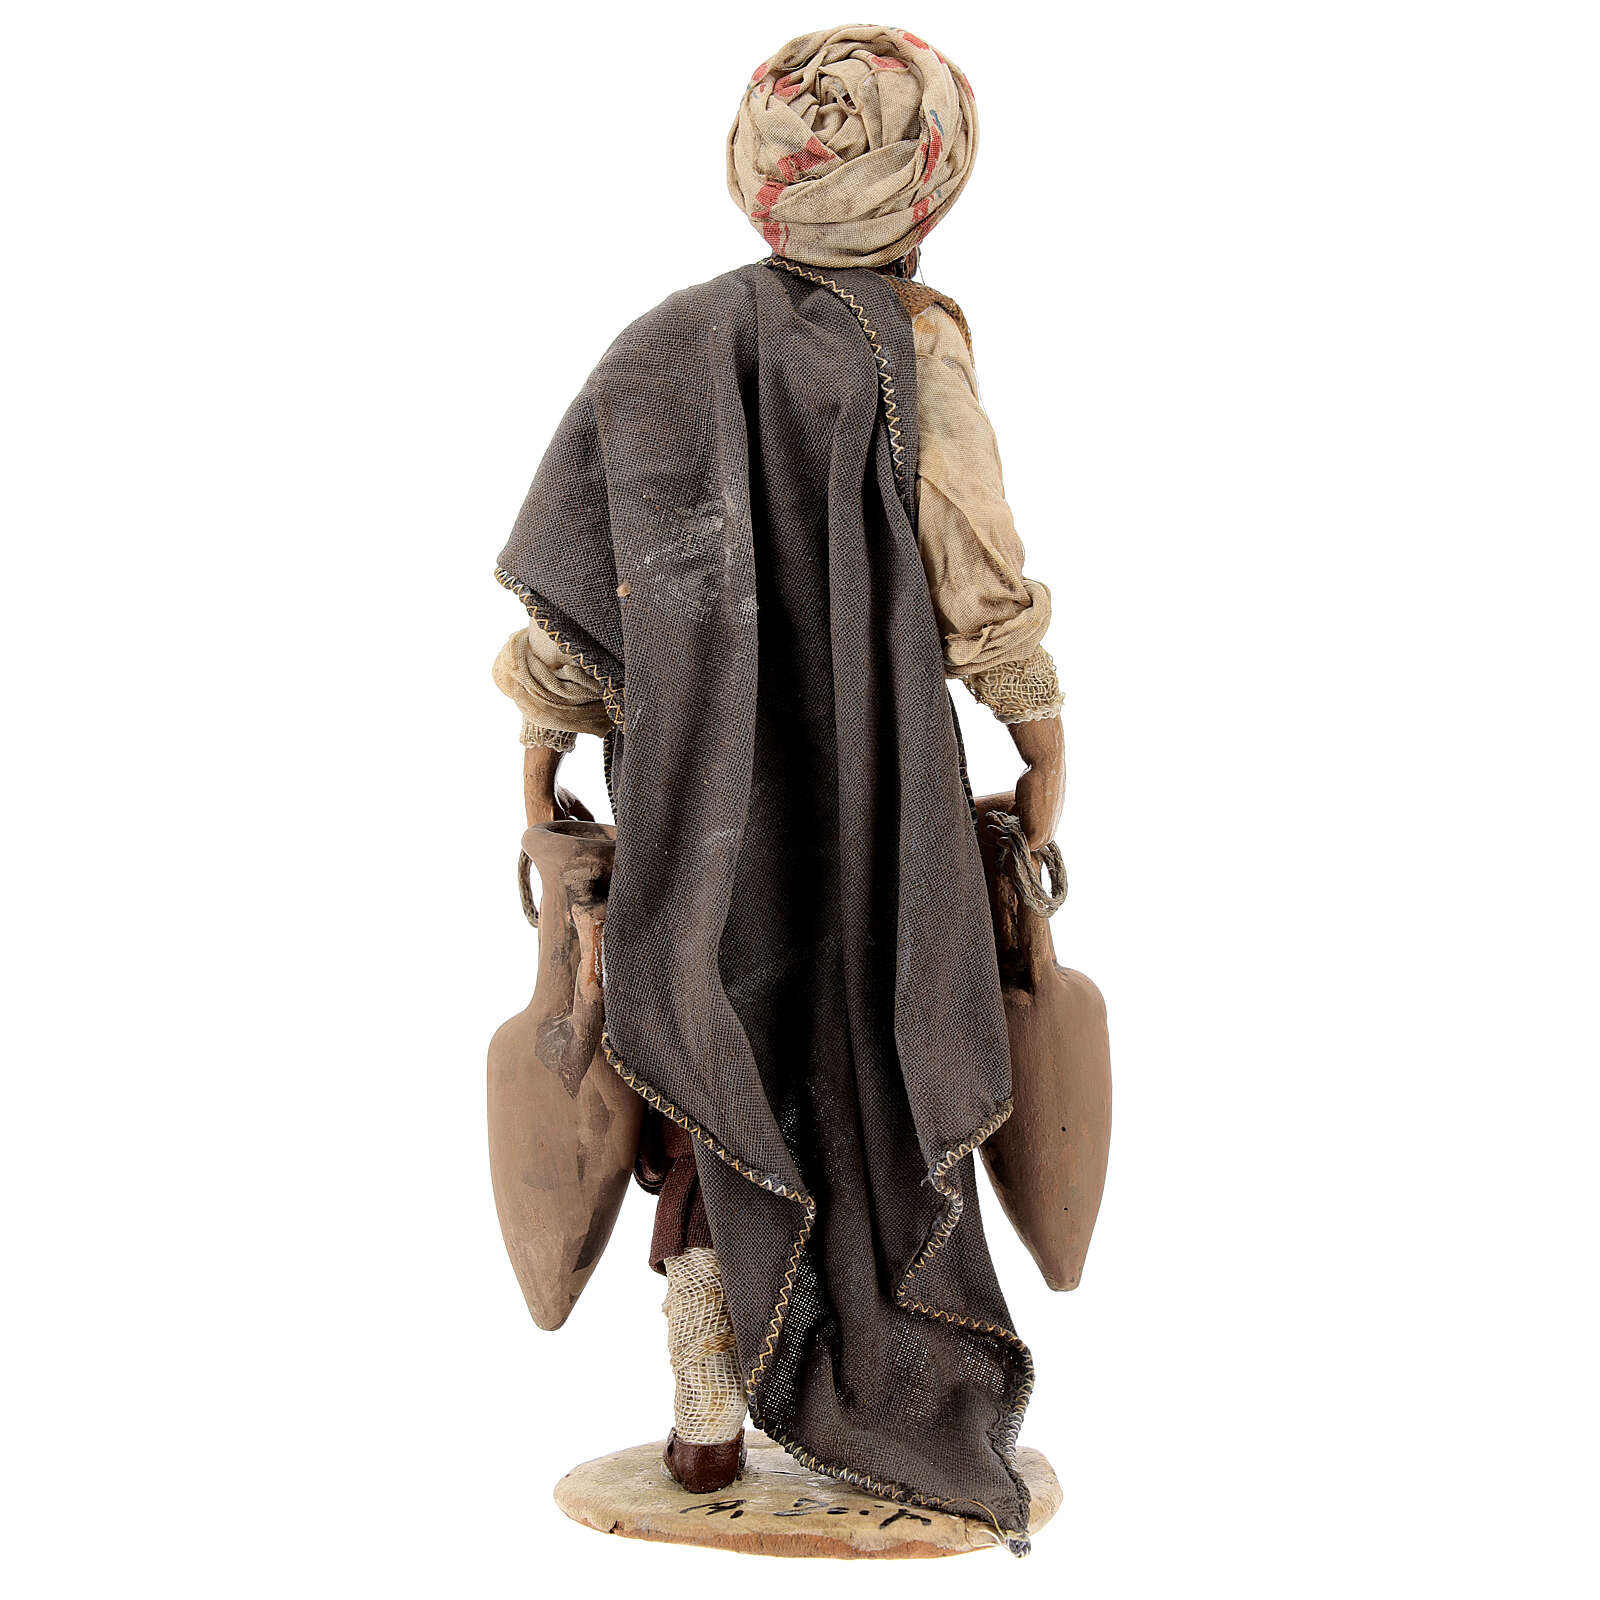 Nativity scene figurine, shepherd with amphora 18cm, Angela Trip 4